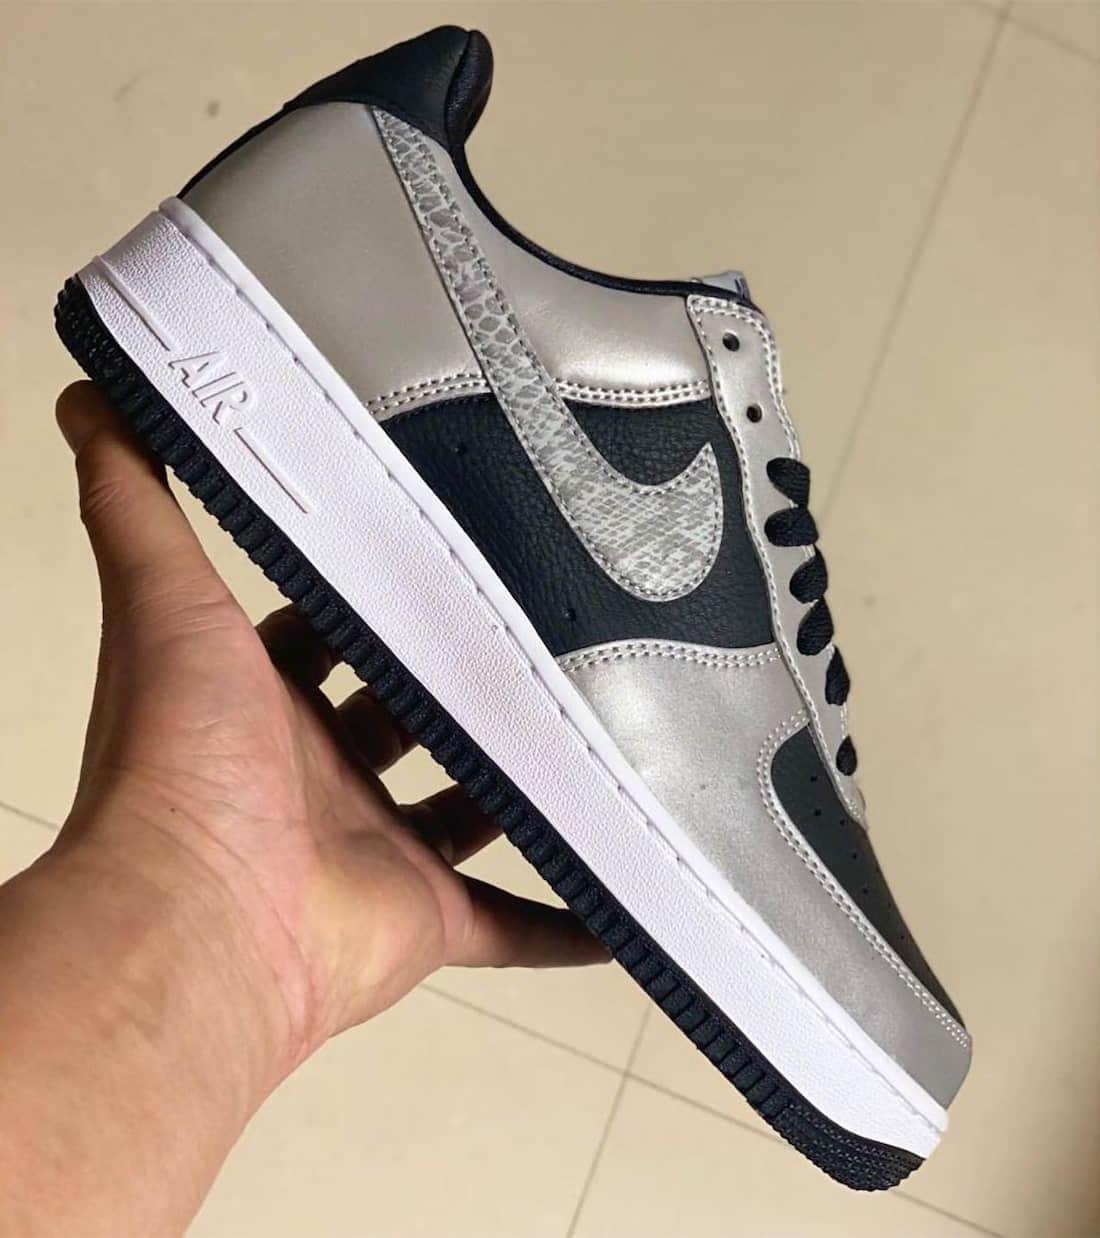 Nike AF1 B反光蛇纹明年回归!这个3M效果超酷! 货号:DJ6033-001